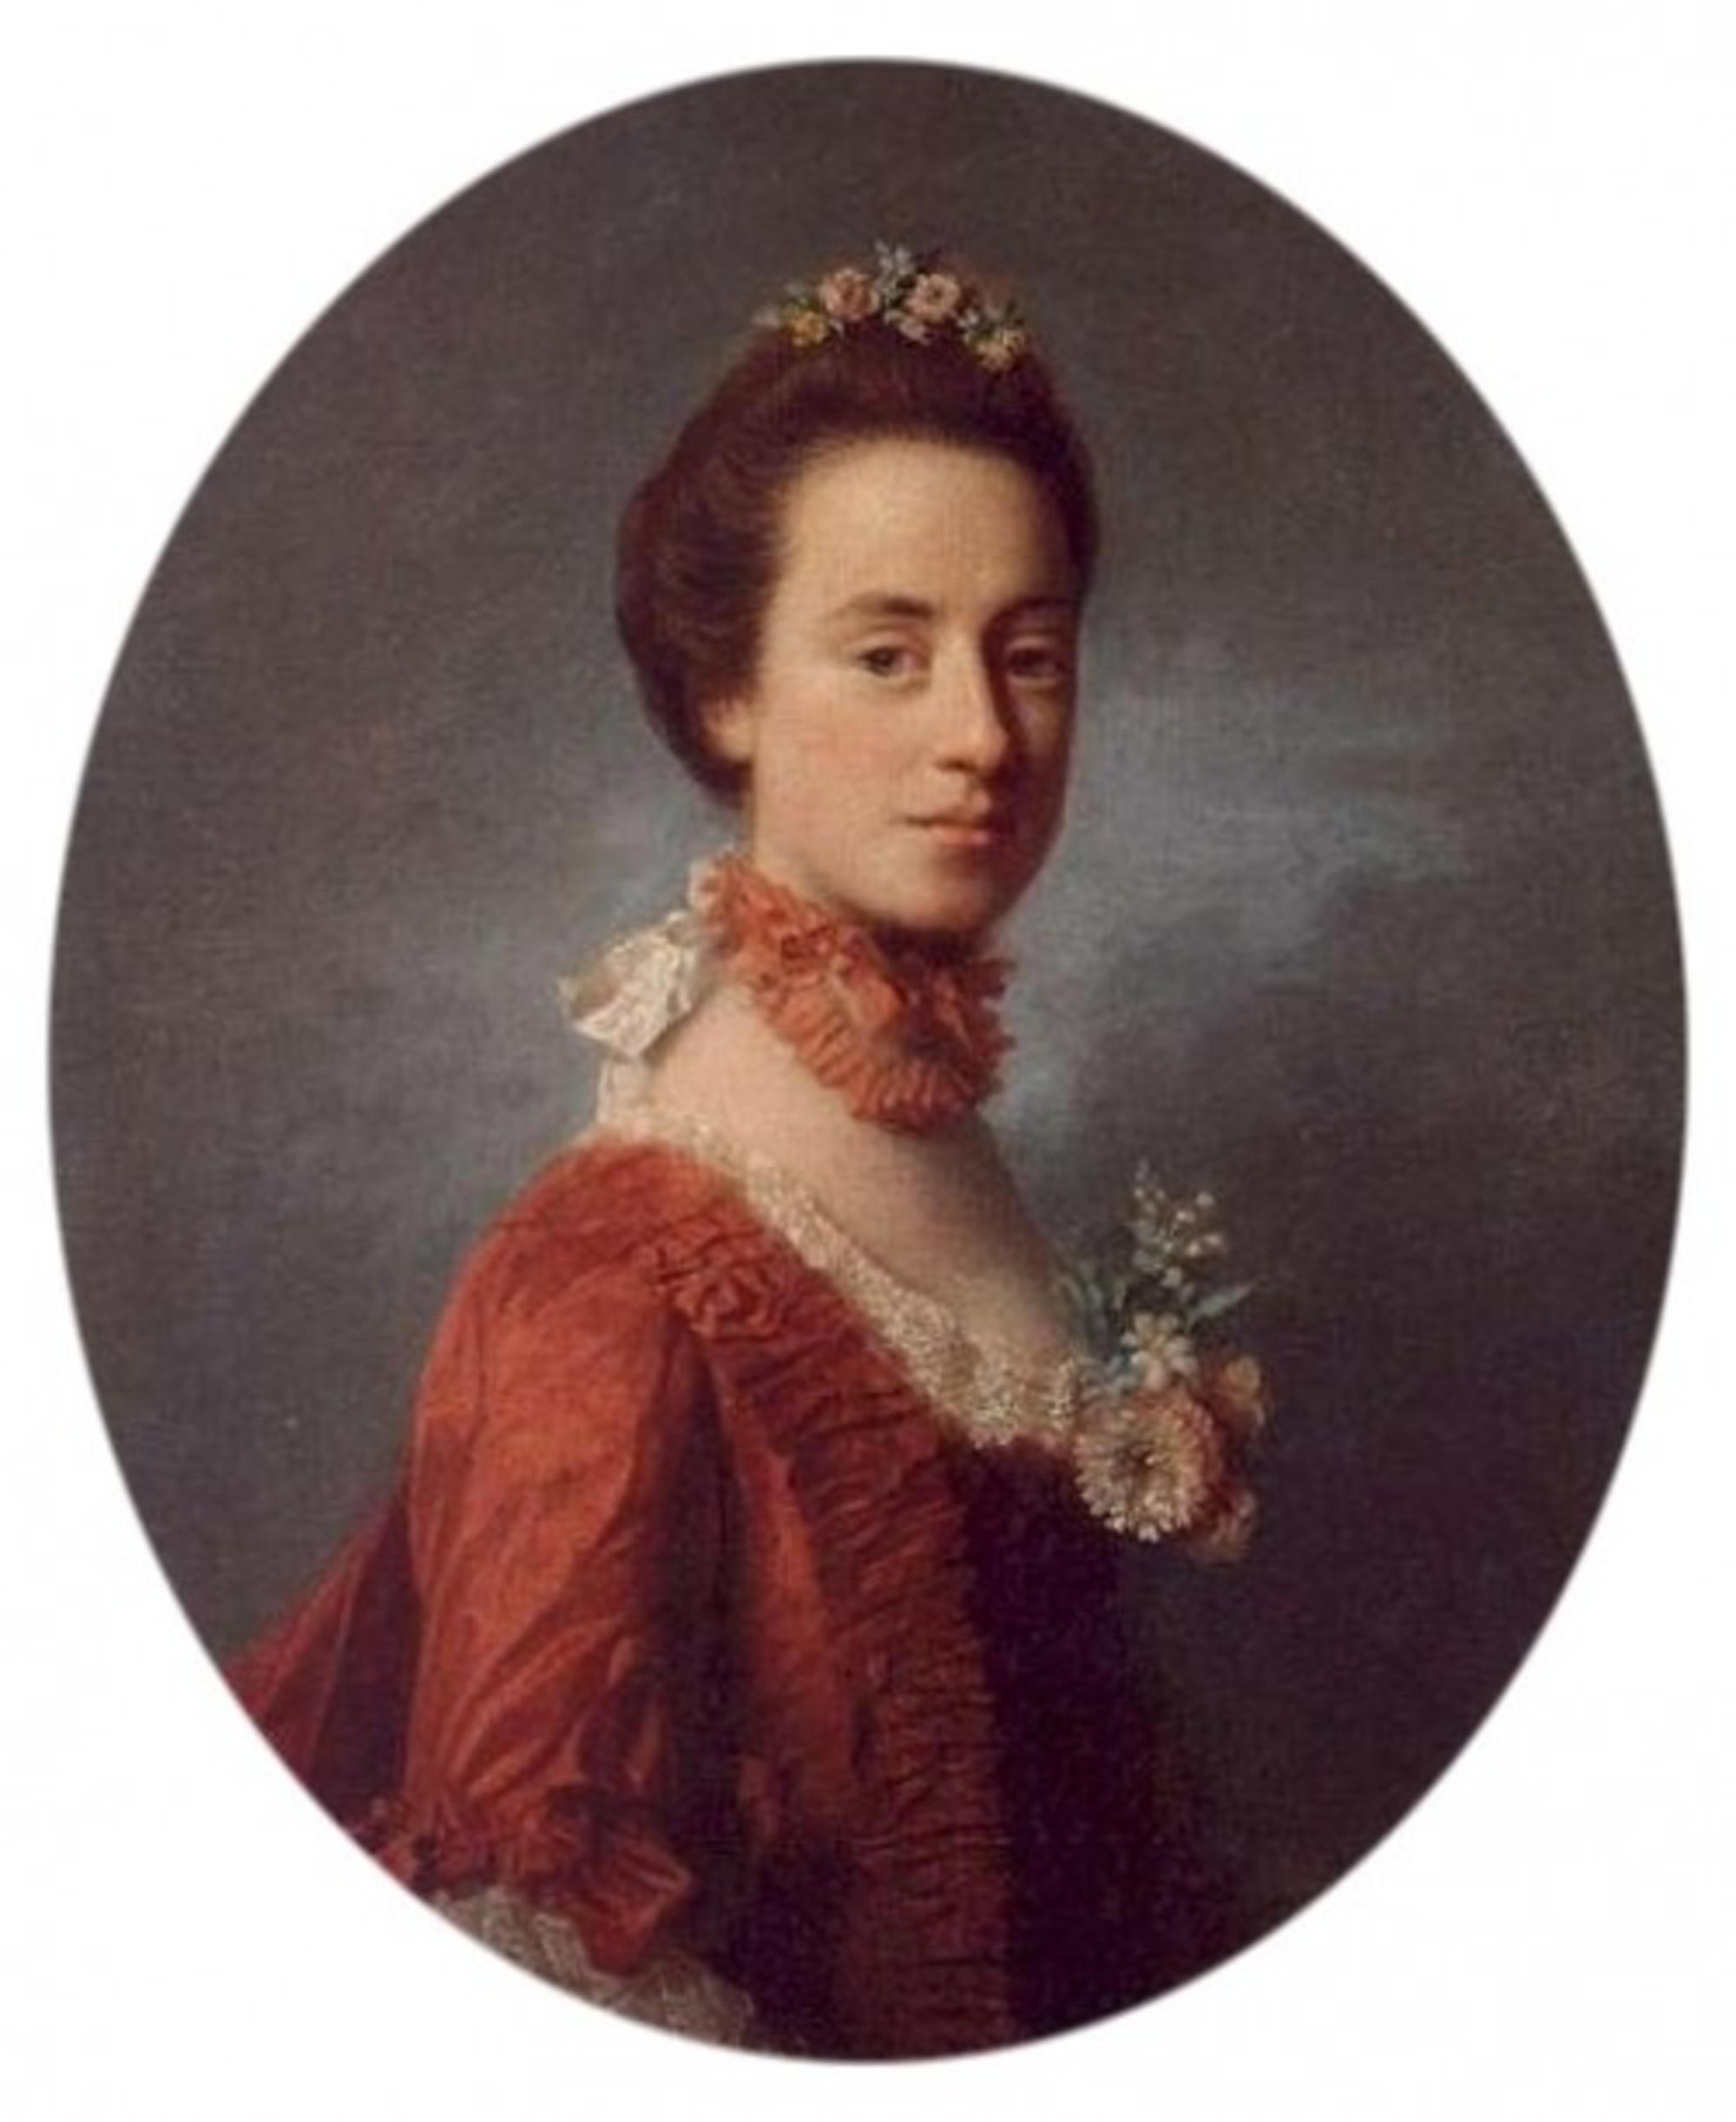 Lady-Robert-Manners00.jpg